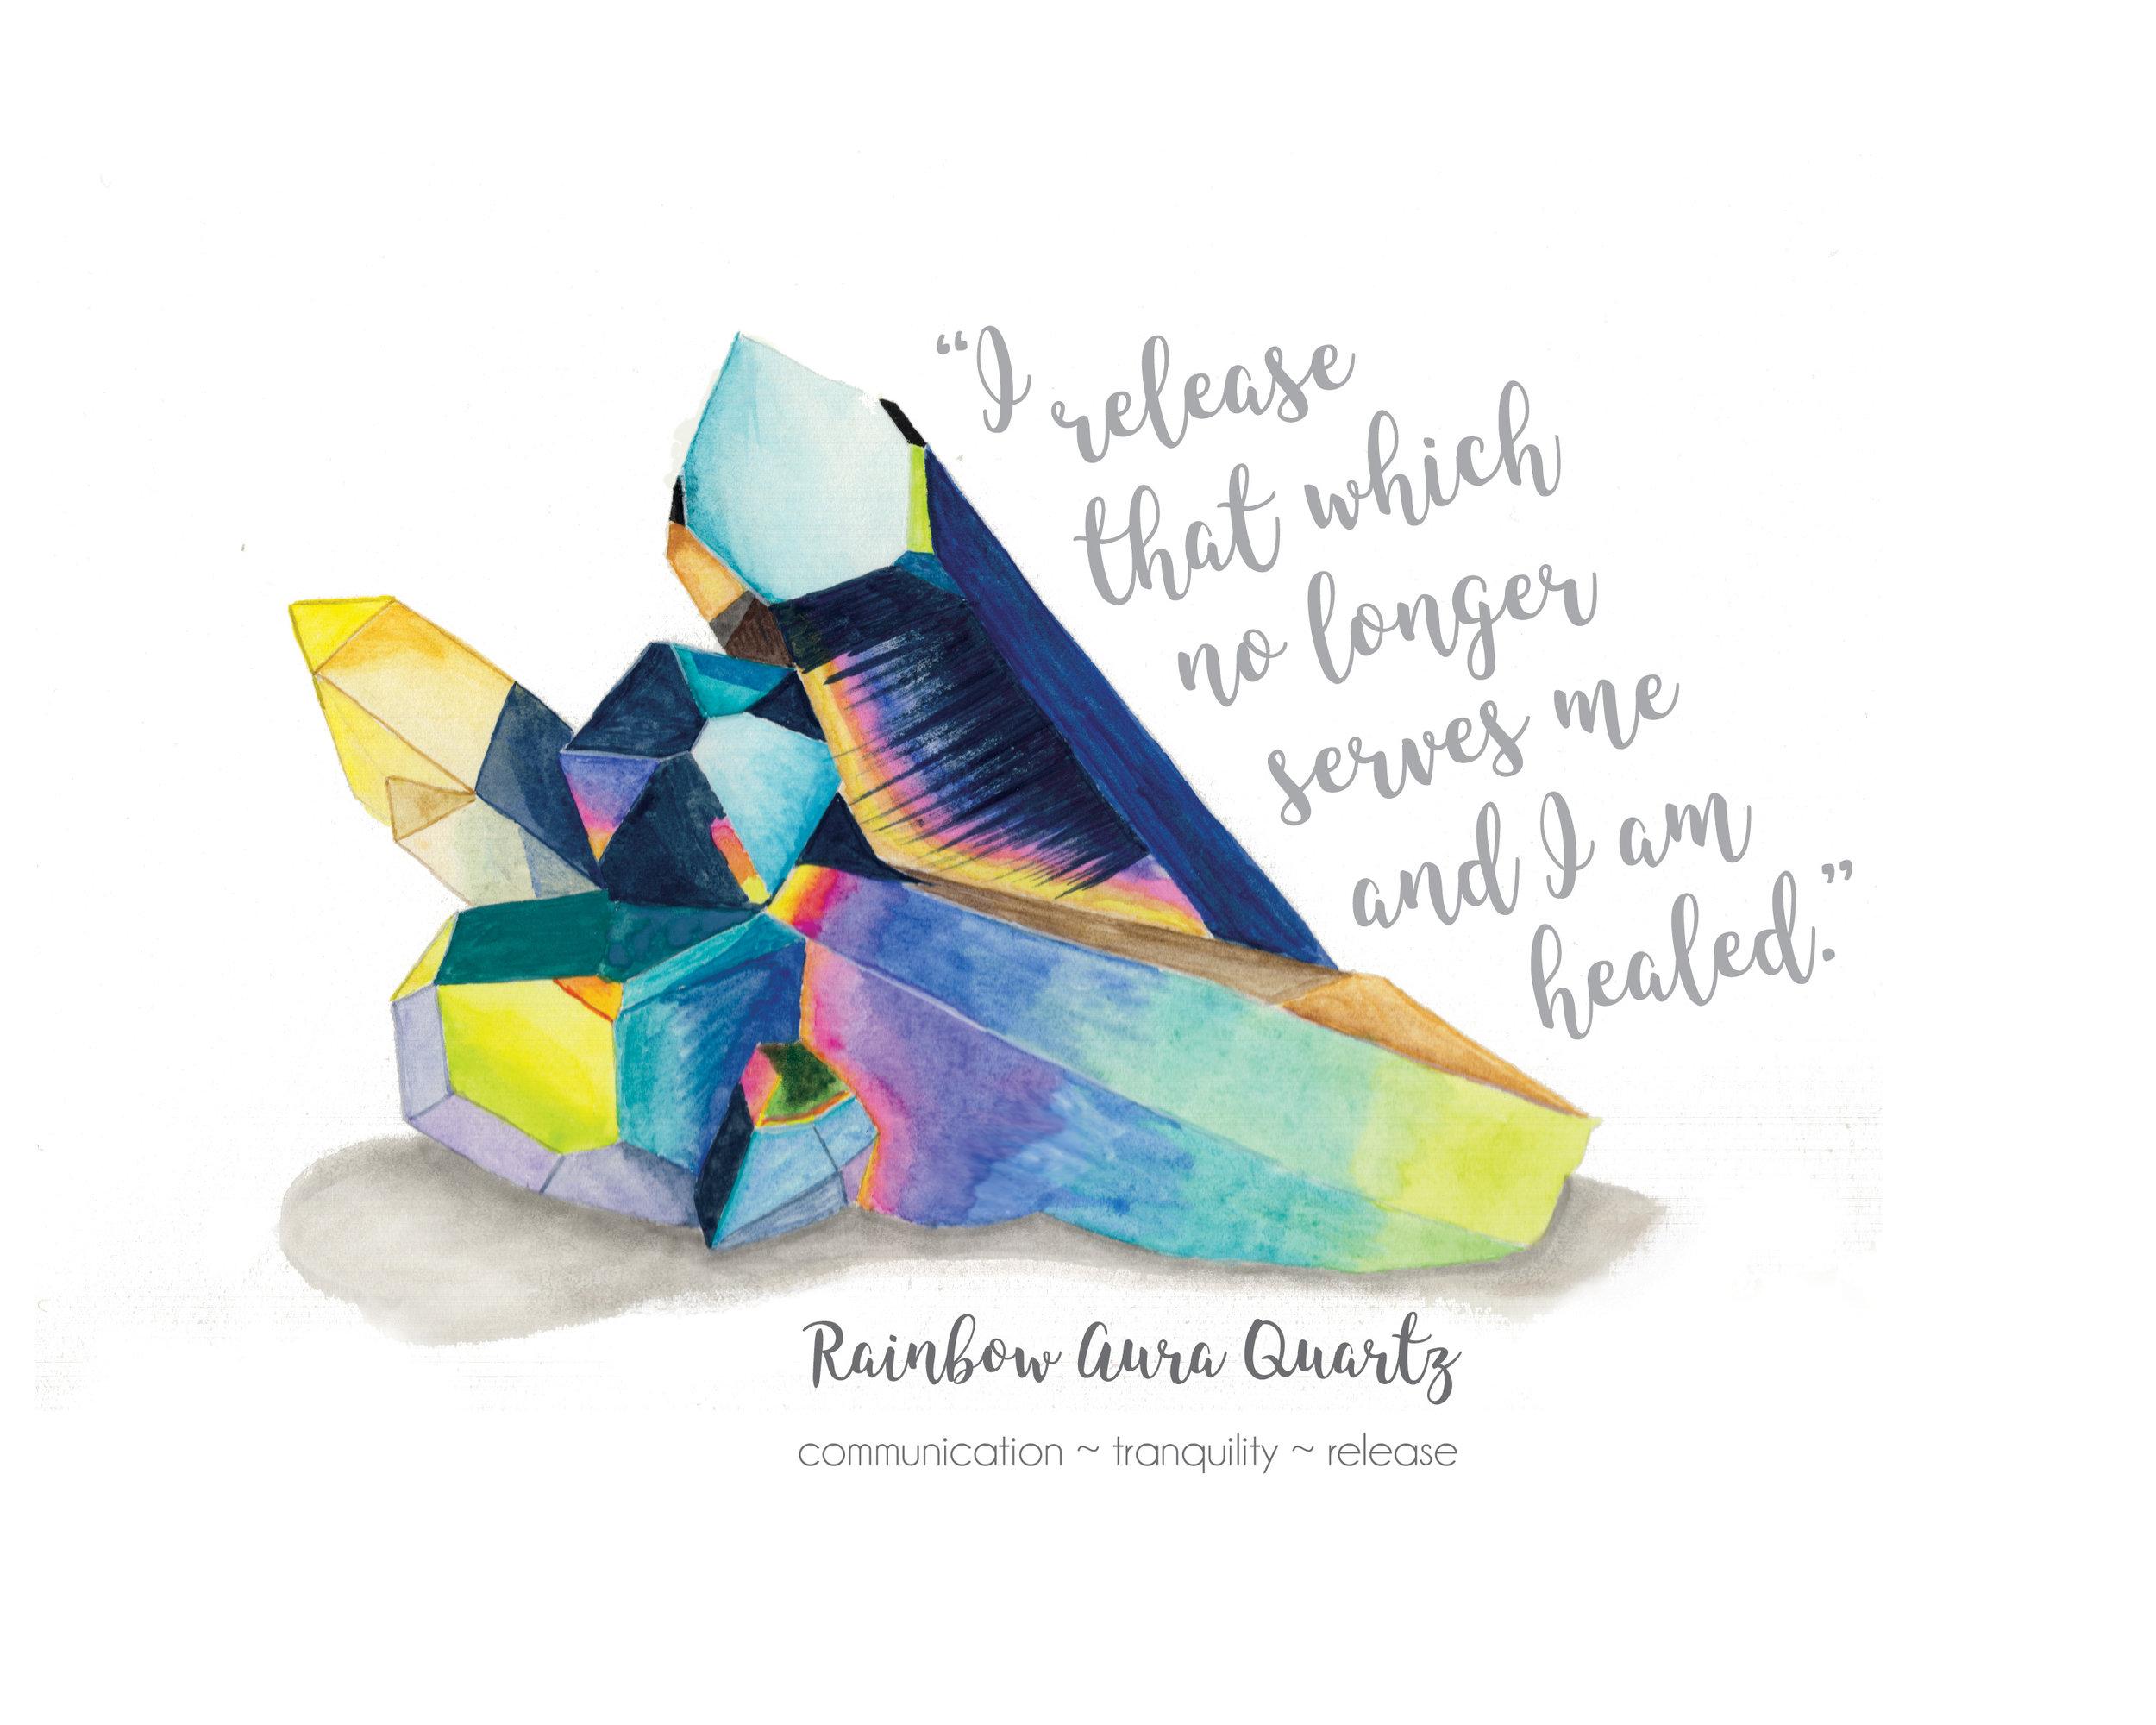 Rainbow Aura Quartz-01-01.jpg